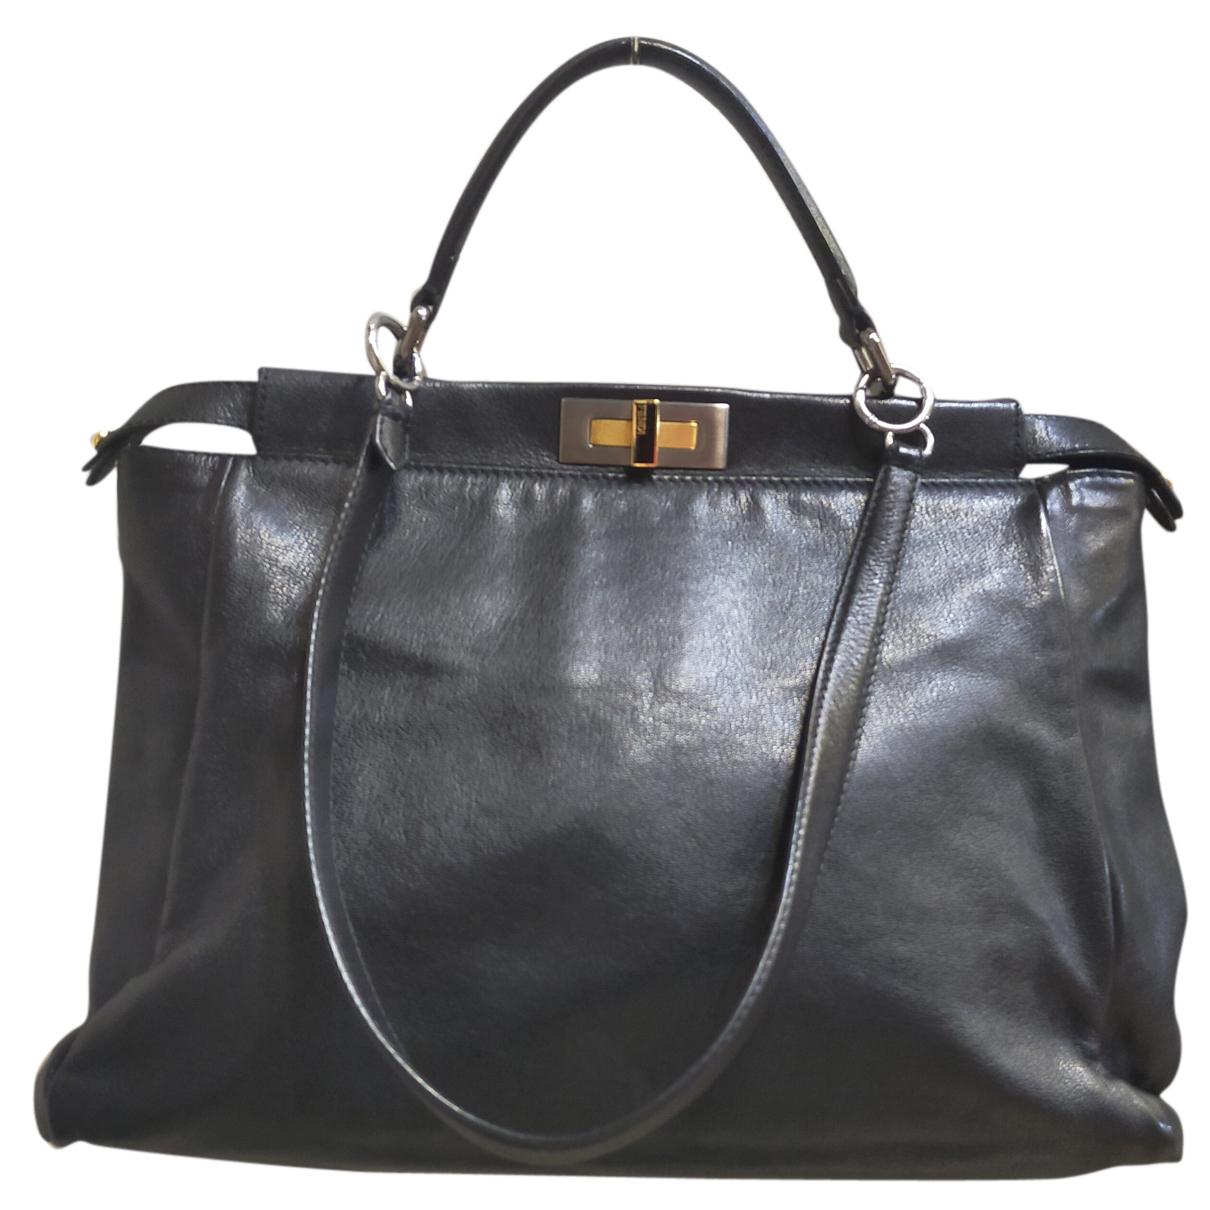 Fendi Peekaboo Black Leather handbag for Women N